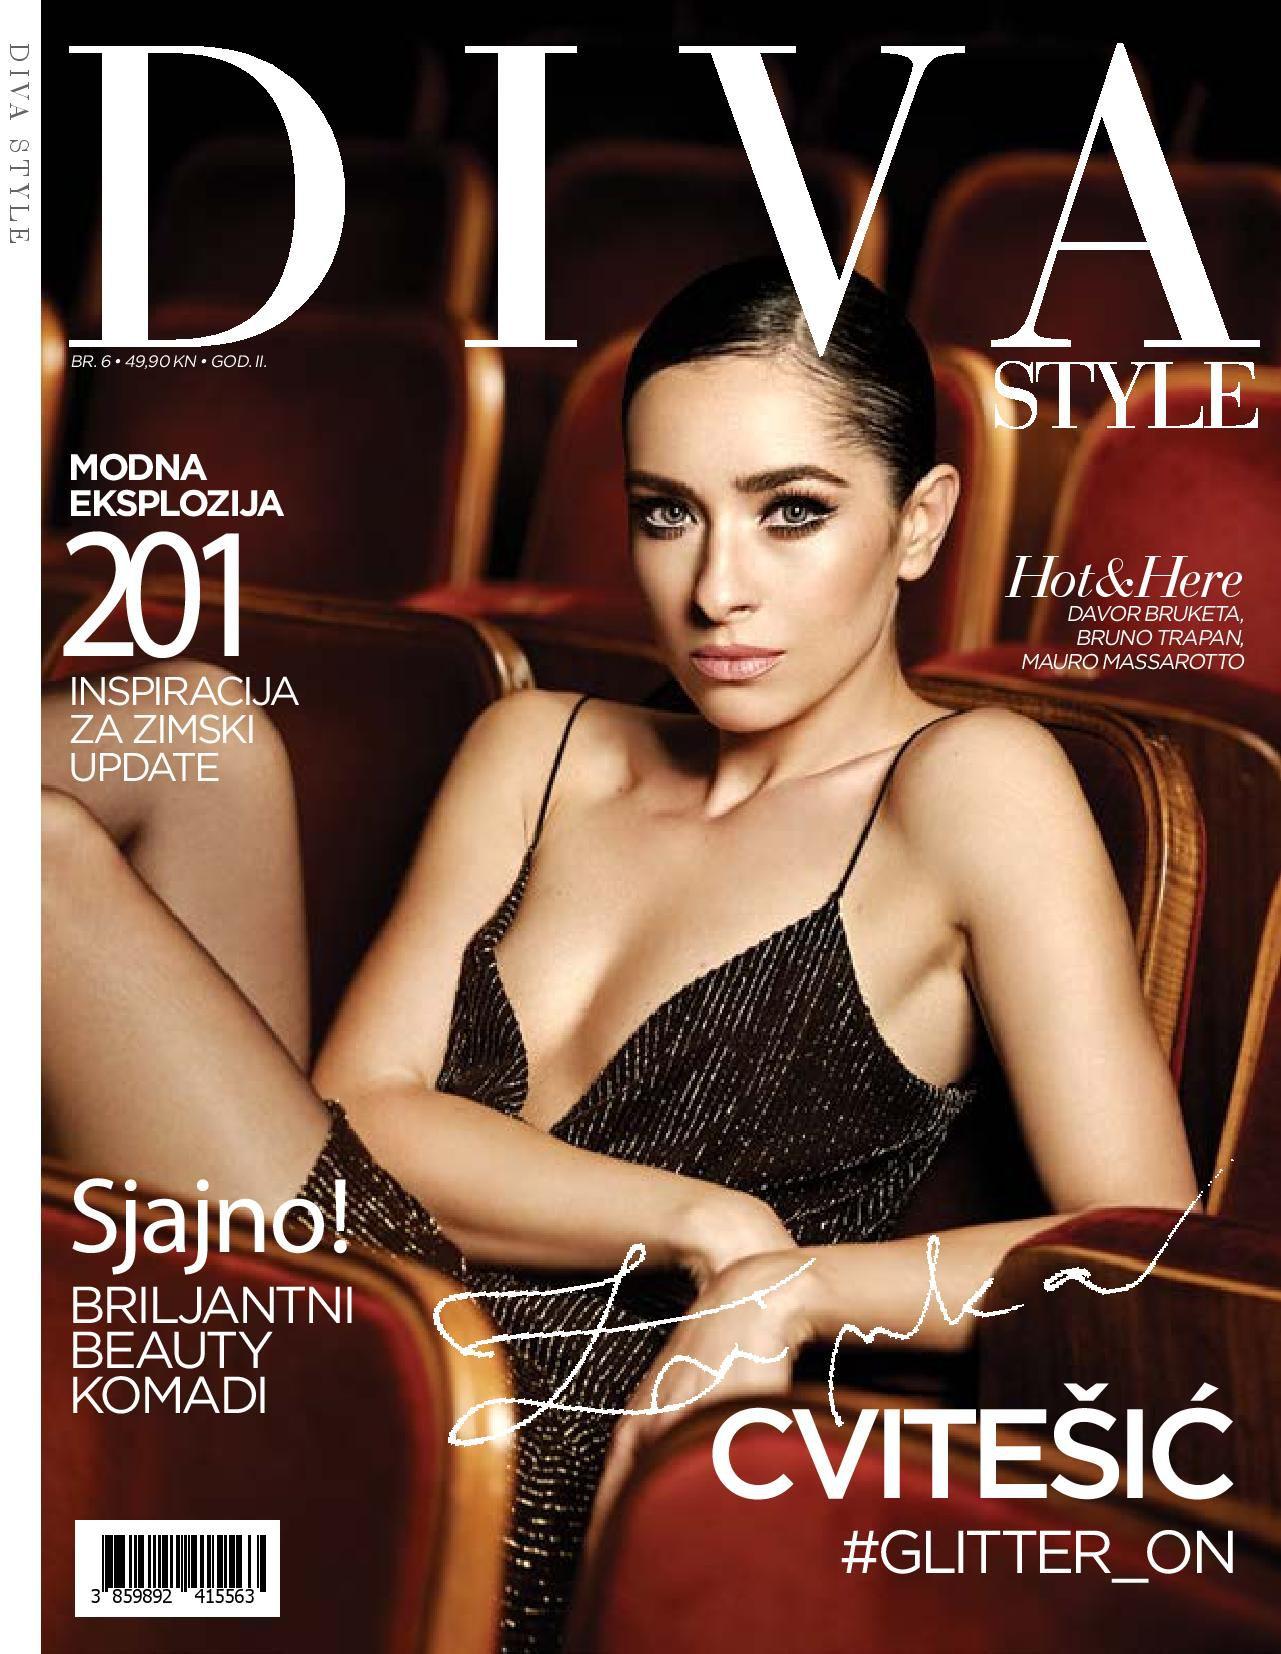 Novi broj Diva Stylea